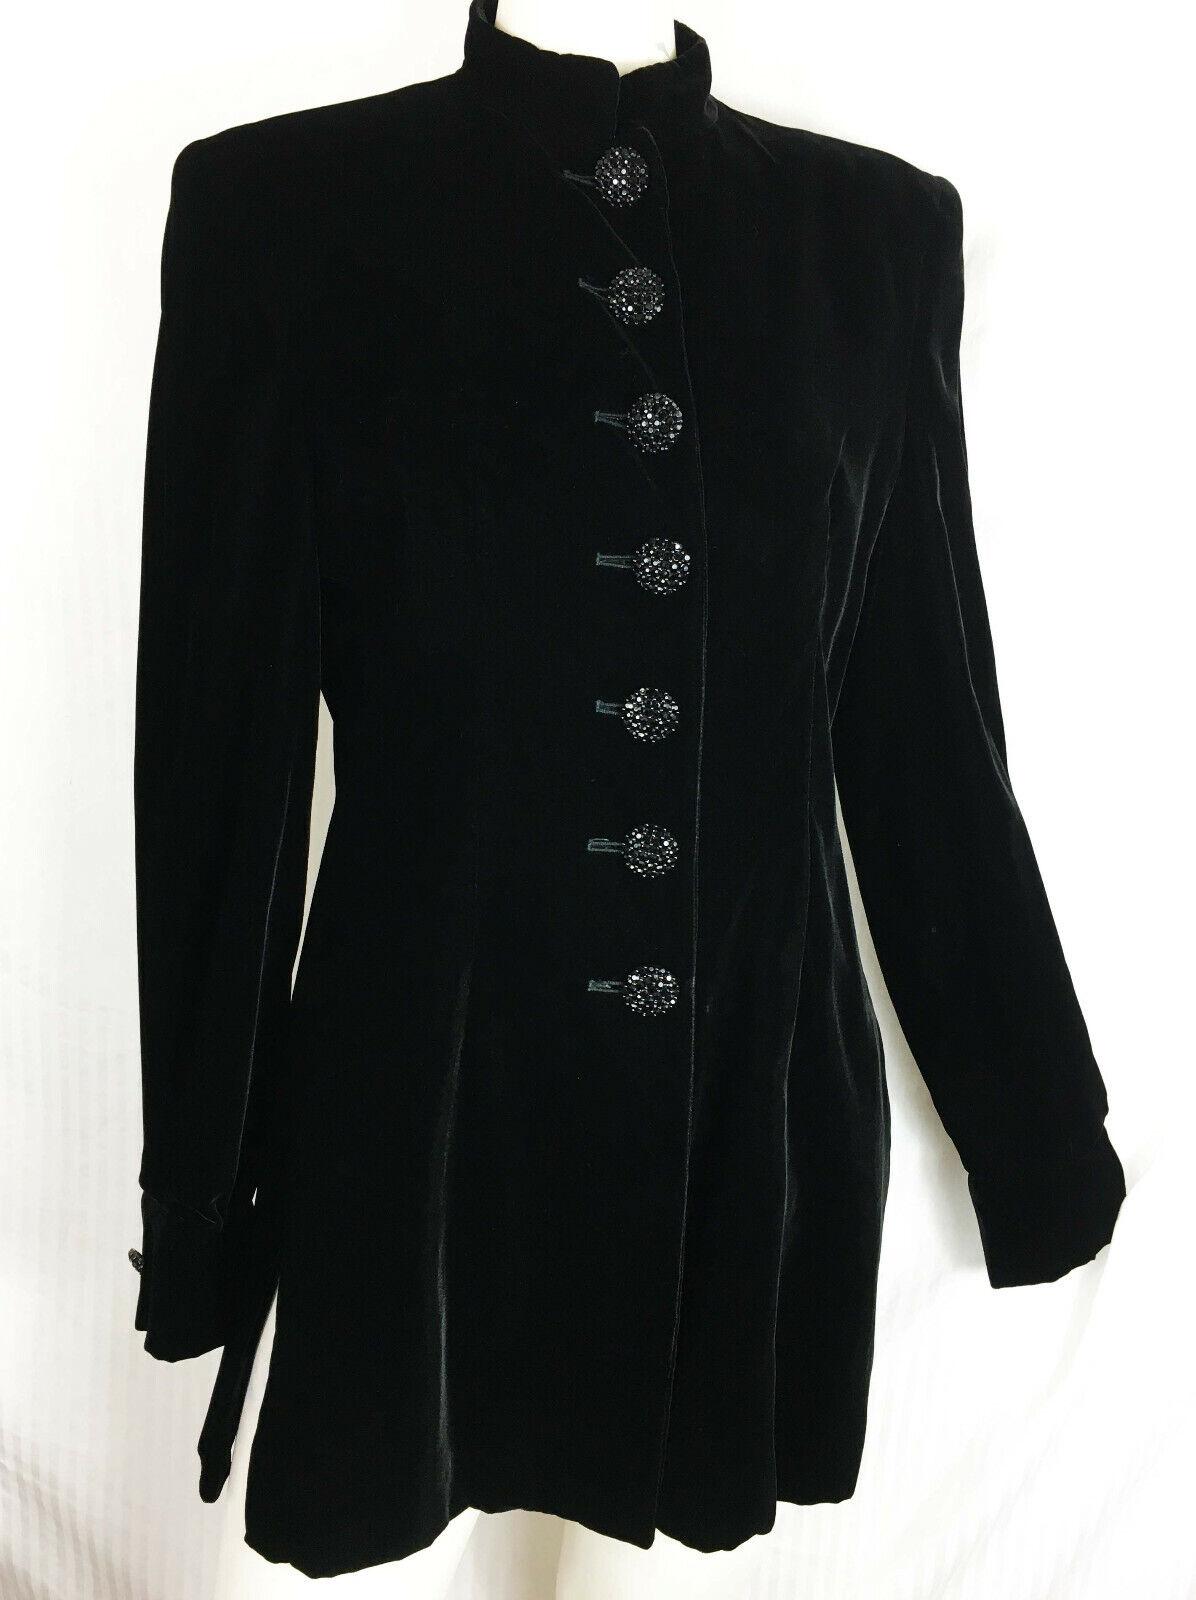 4 St John Evening Velvet Jacket Coat Black Jet Pave Riding Mandarin Collar